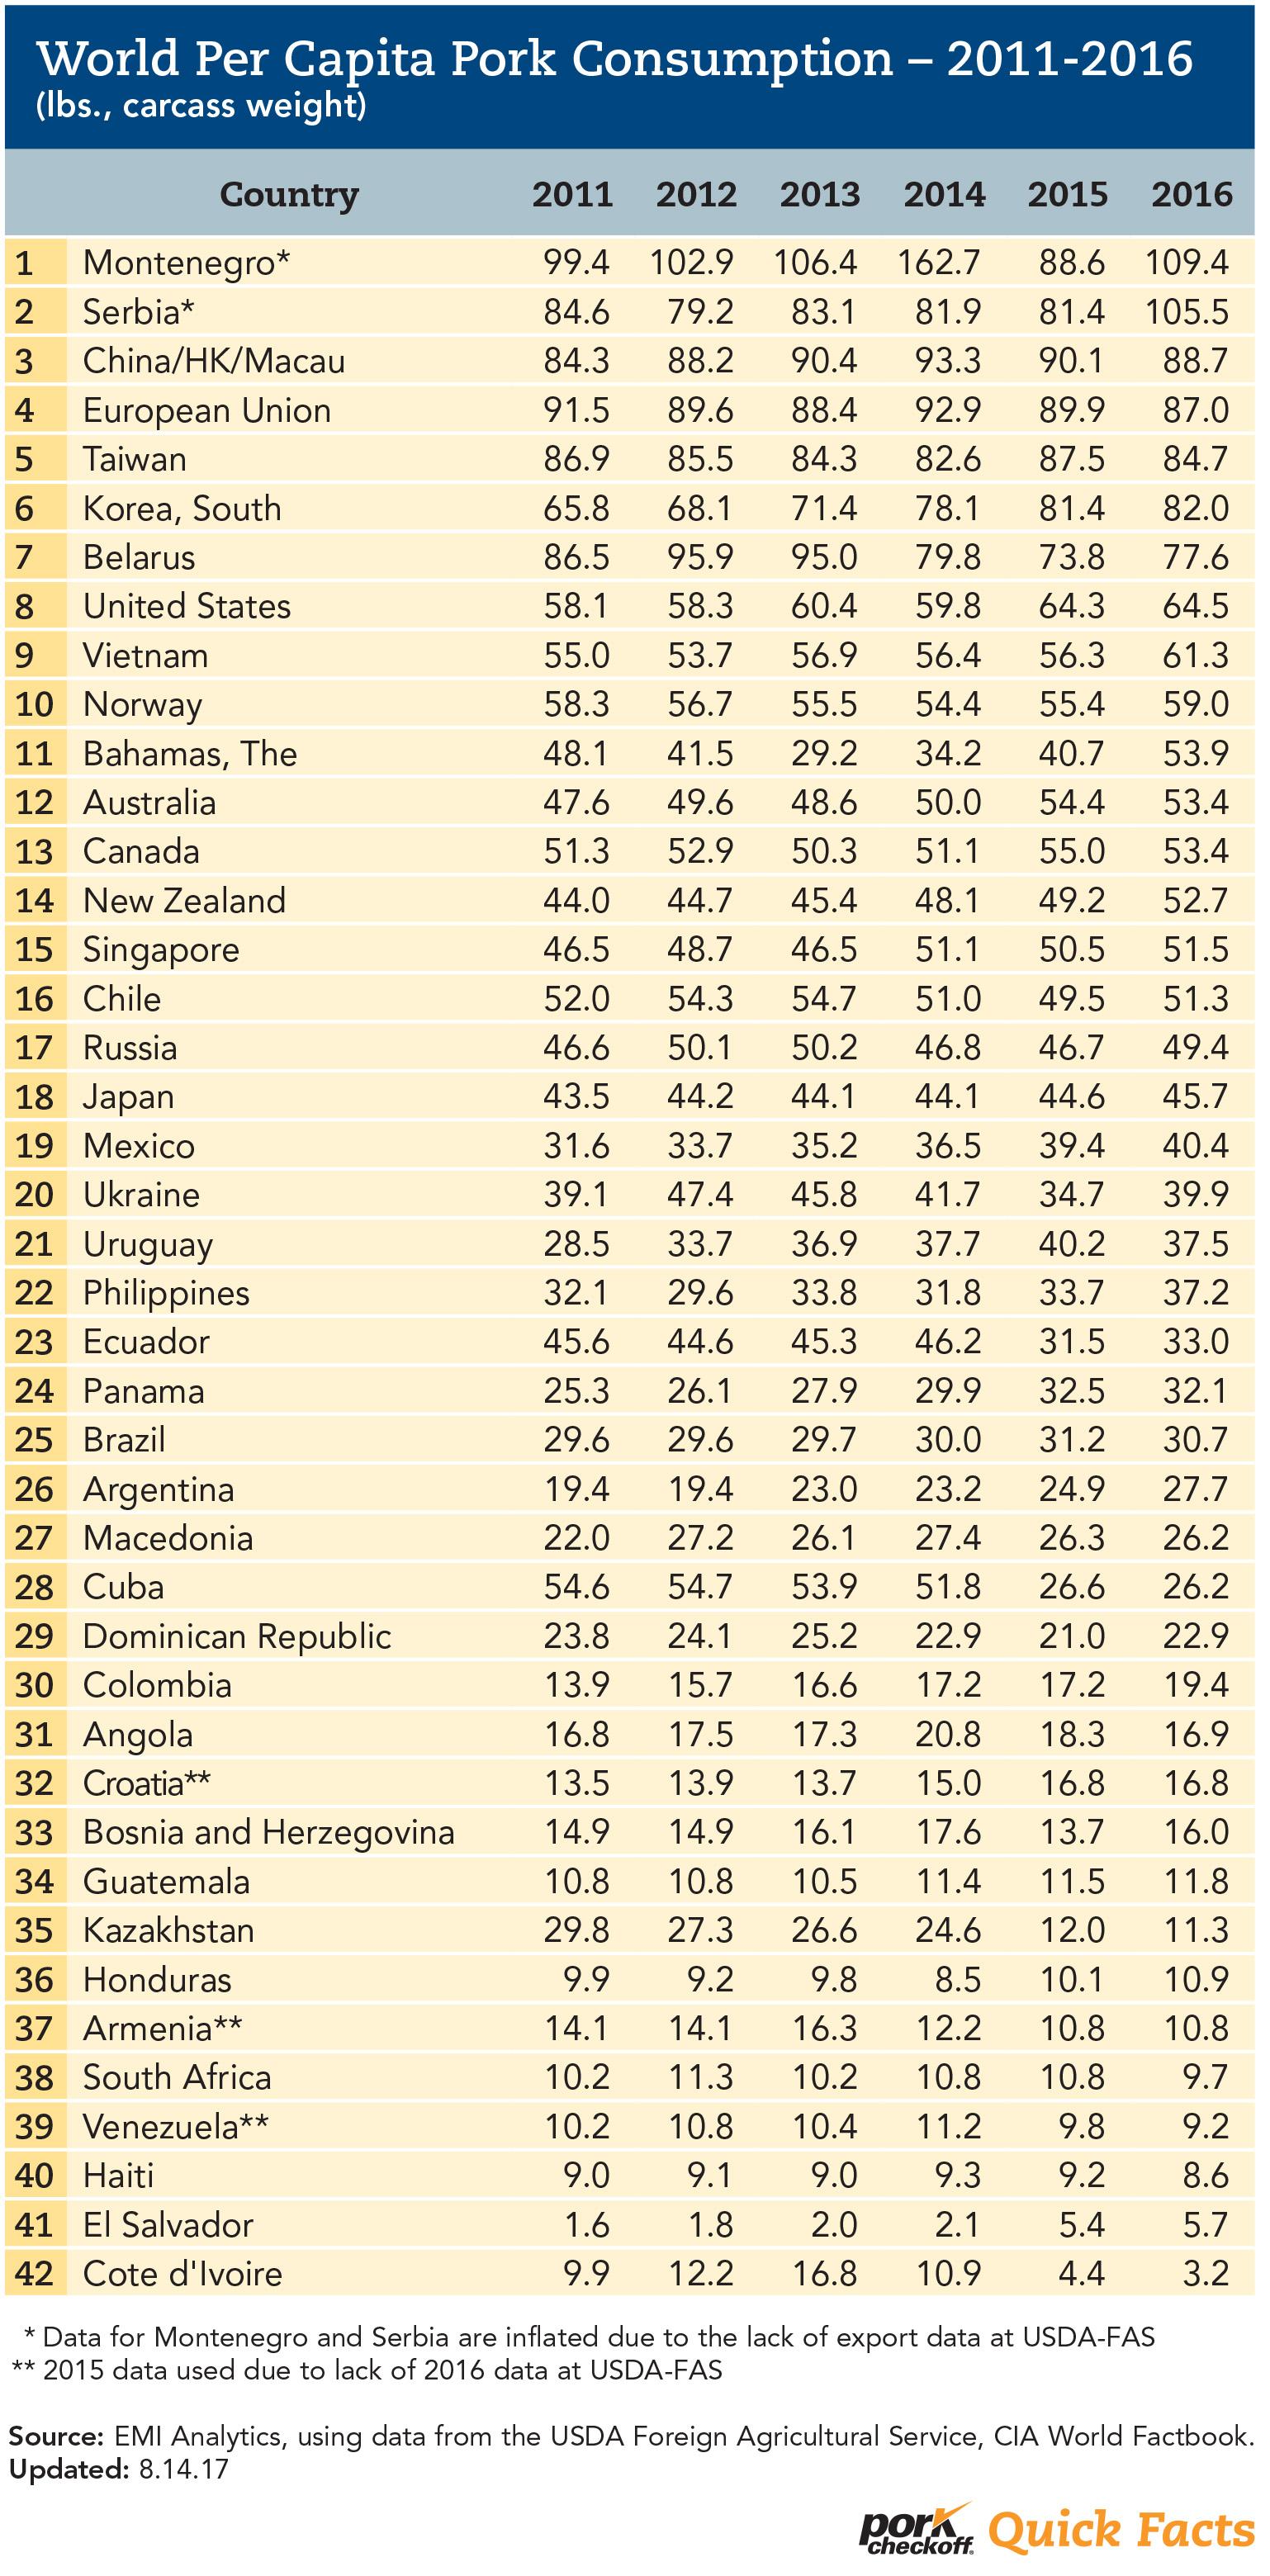 World Per Capita Pork Consumption  Pork Checkoff